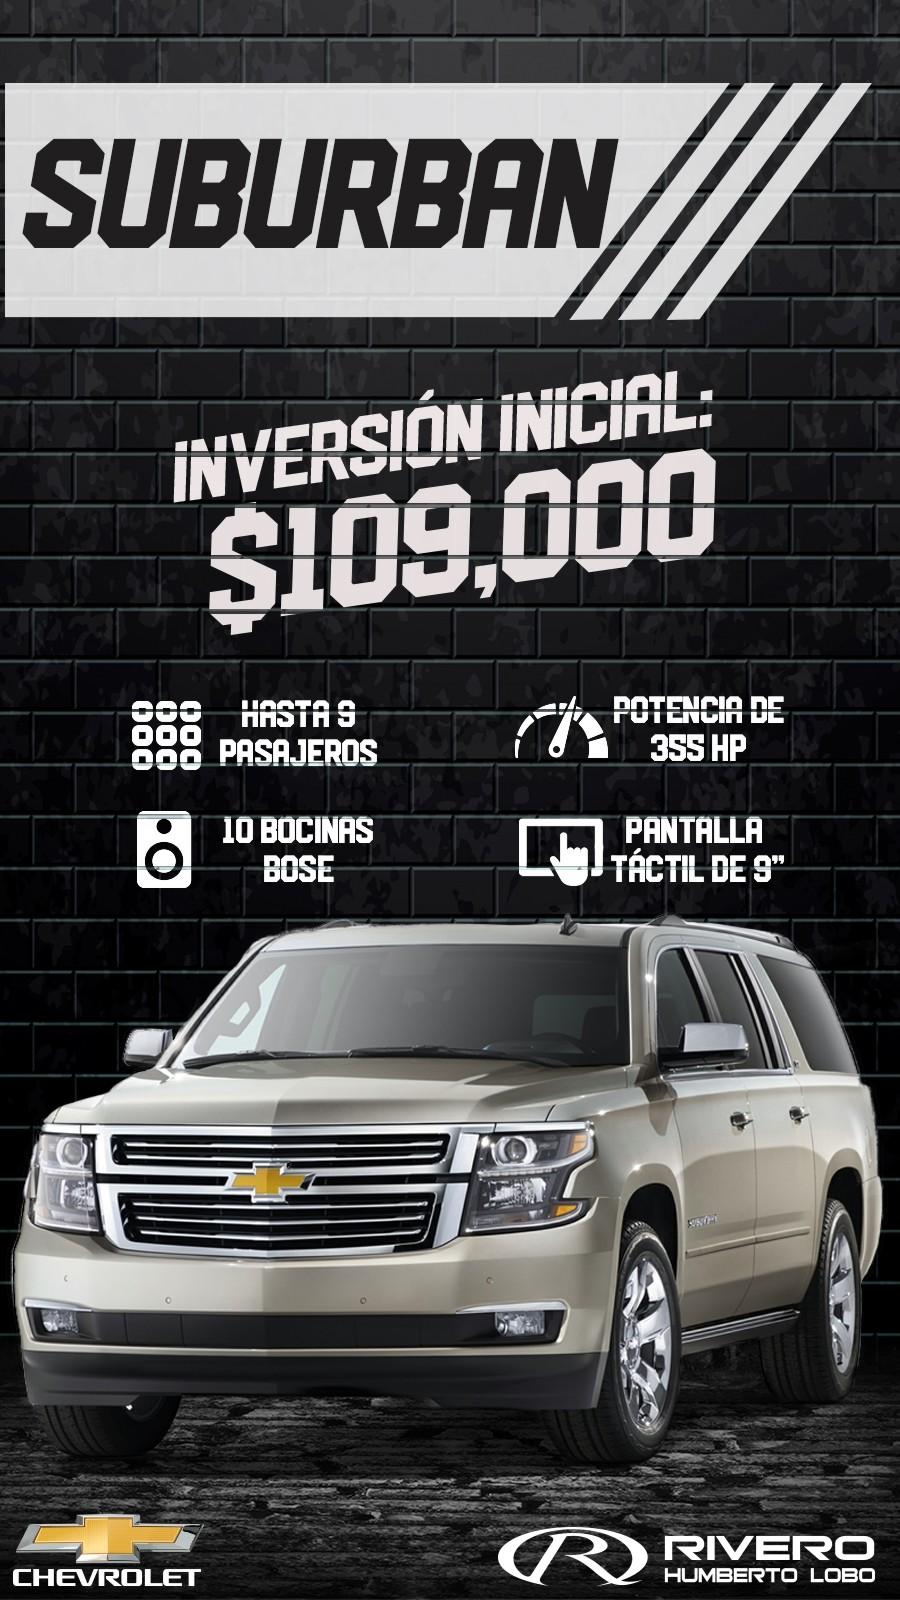 Chevrolet Grupo Rivero Suburban 2017 En Monterrey